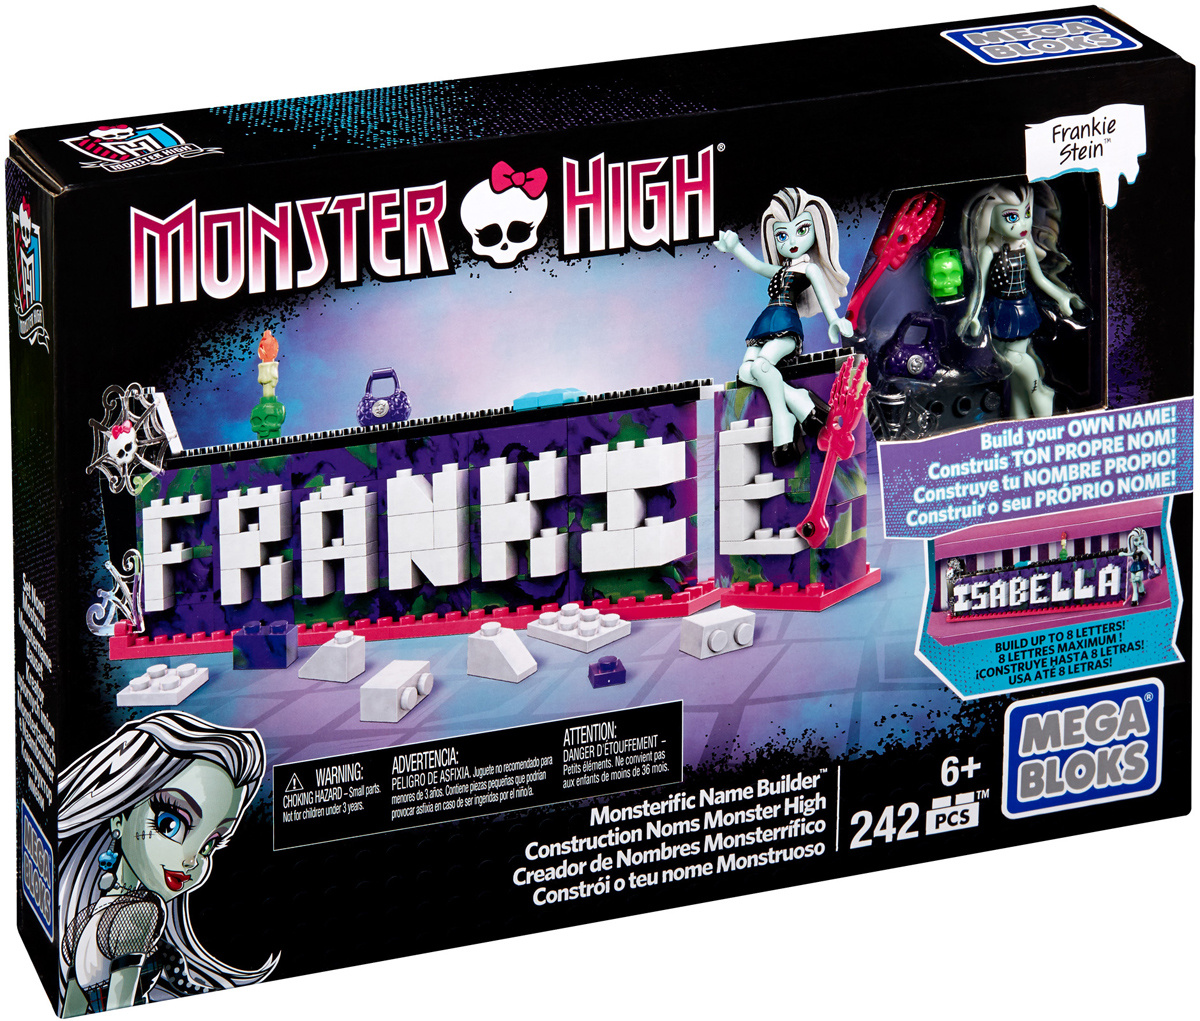 Mega Bloks Monster High Конструктор Табличка для имени Monster High #1